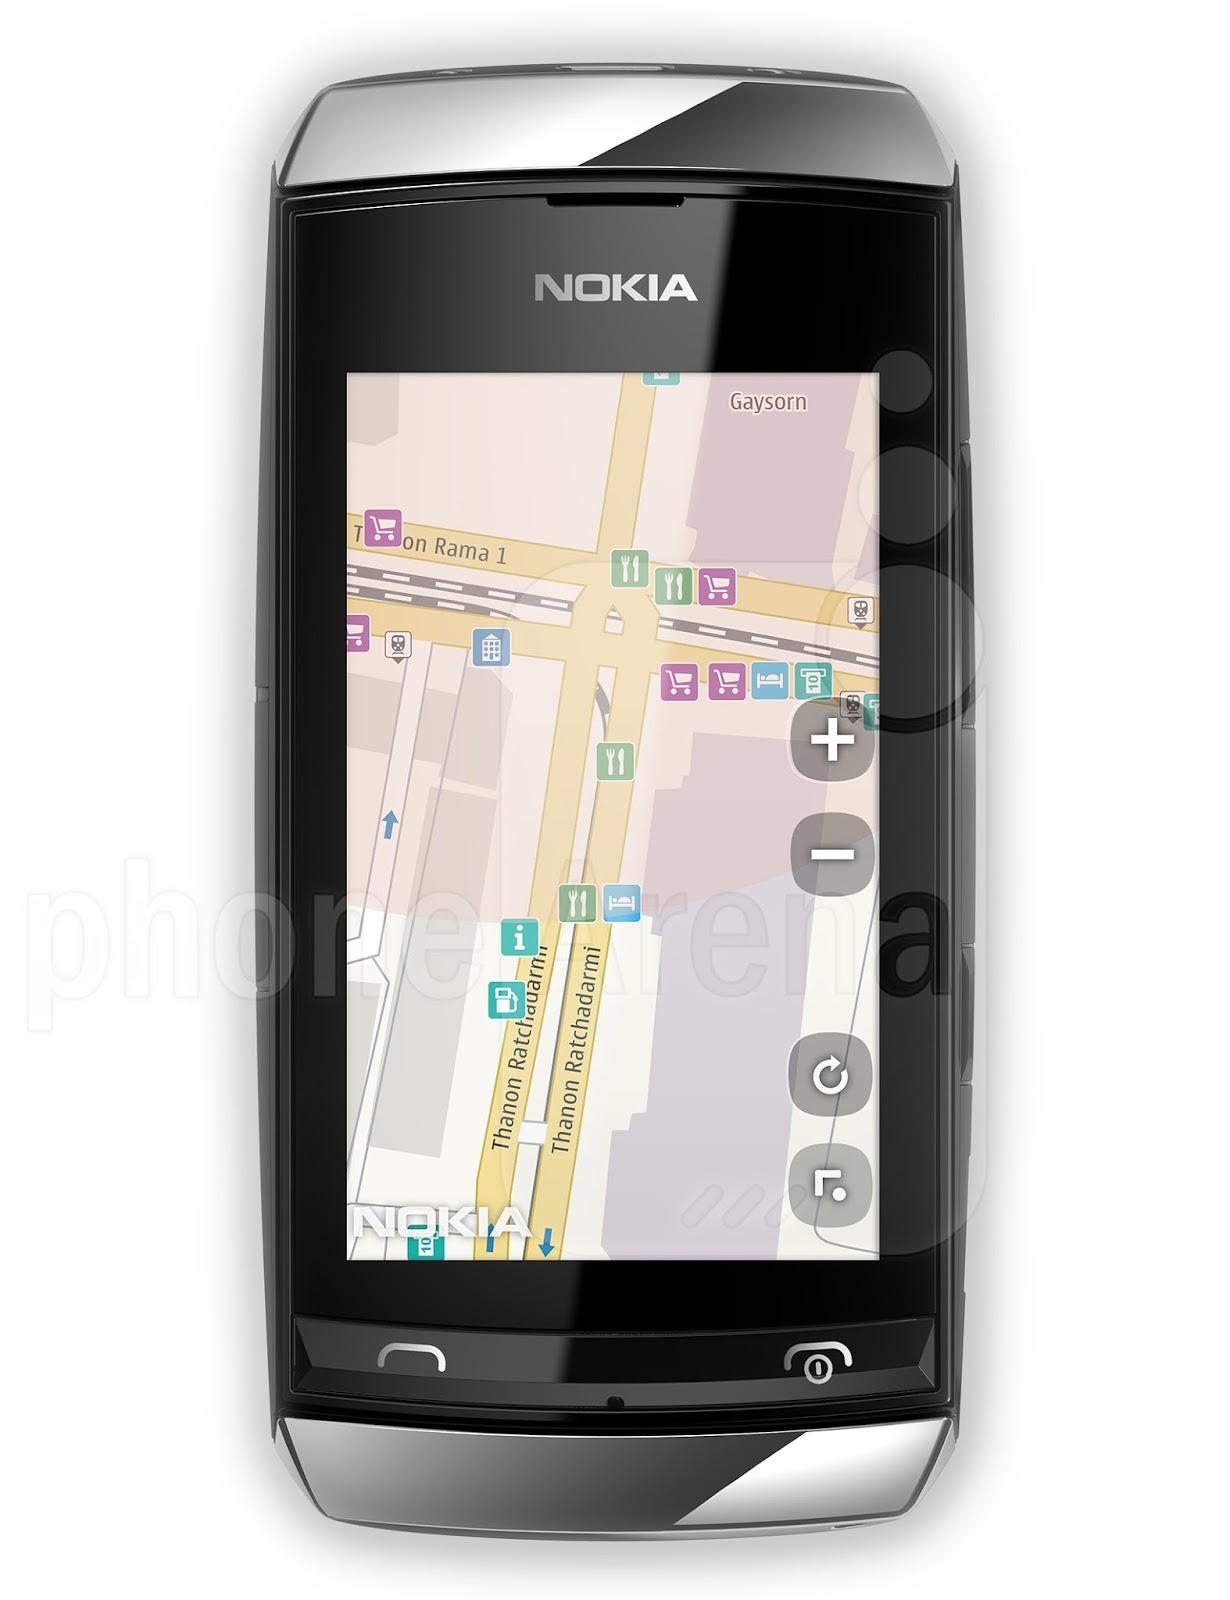 nokia asha 306 user manual guide the free download manual guide pdf rh manualsguide pdf blogspot com Nokia 1110 Nokia 1110